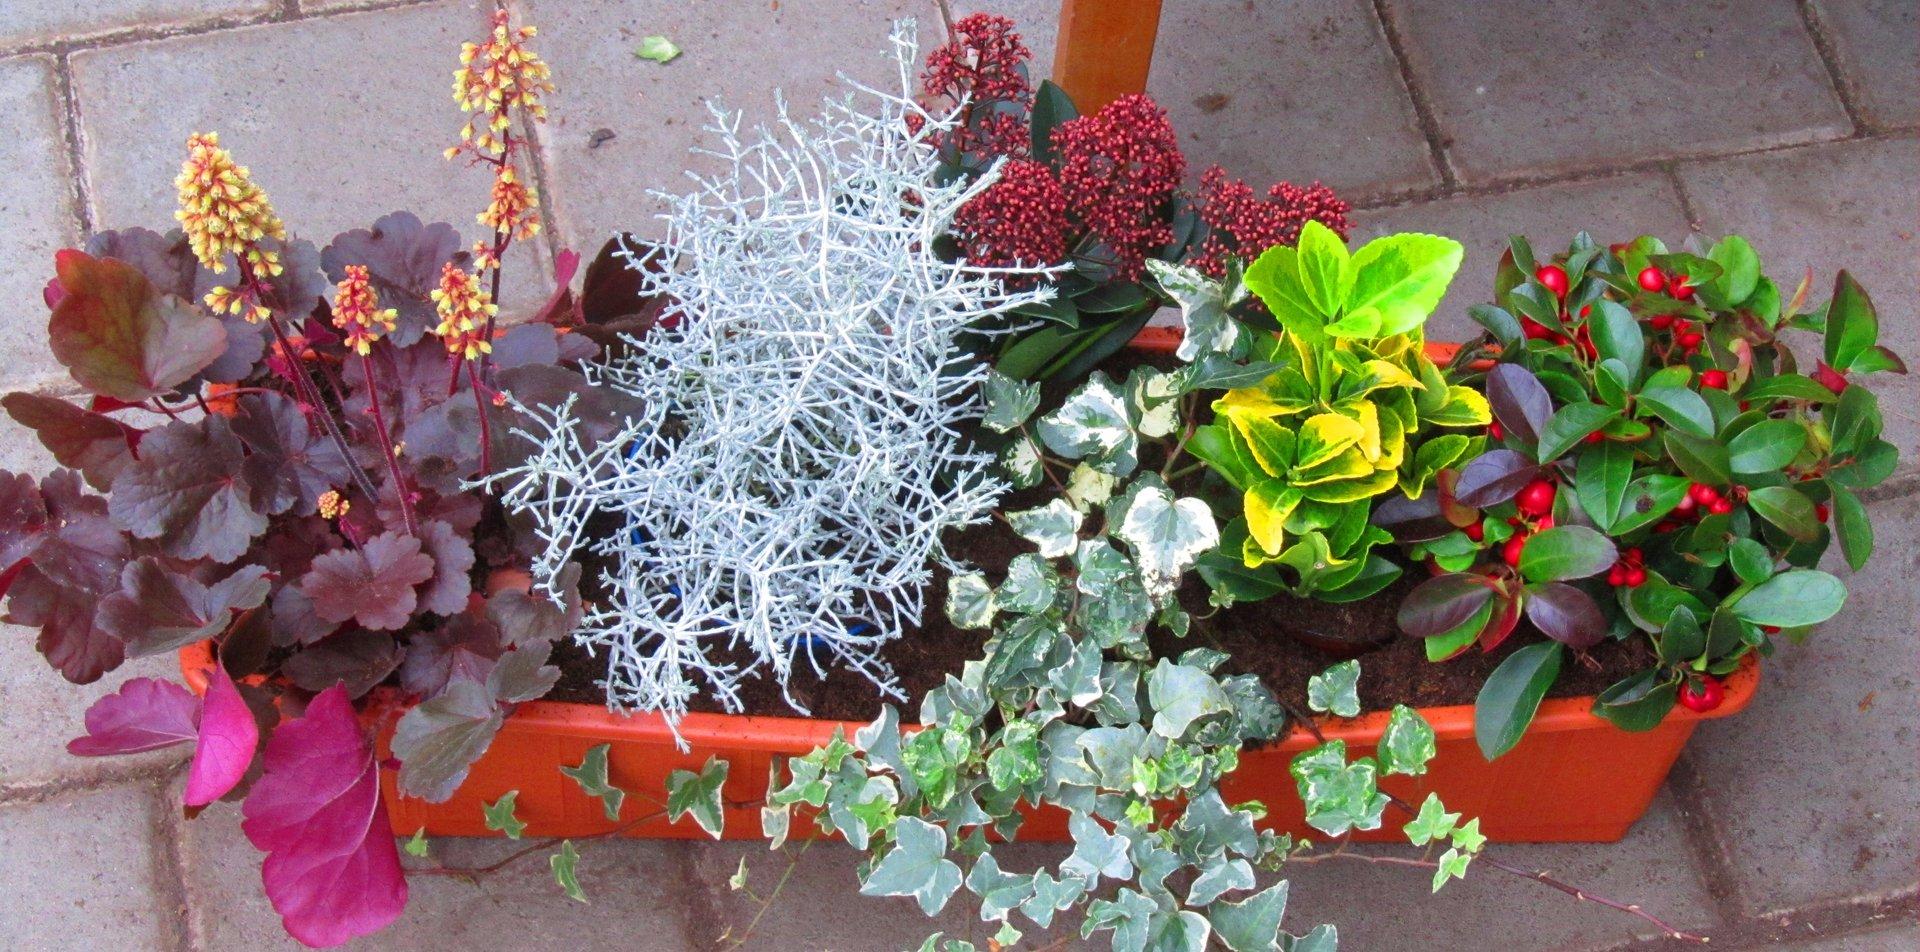 balkonpflanzen set f r balkonkasten 60 cm lang pflanzen. Black Bedroom Furniture Sets. Home Design Ideas